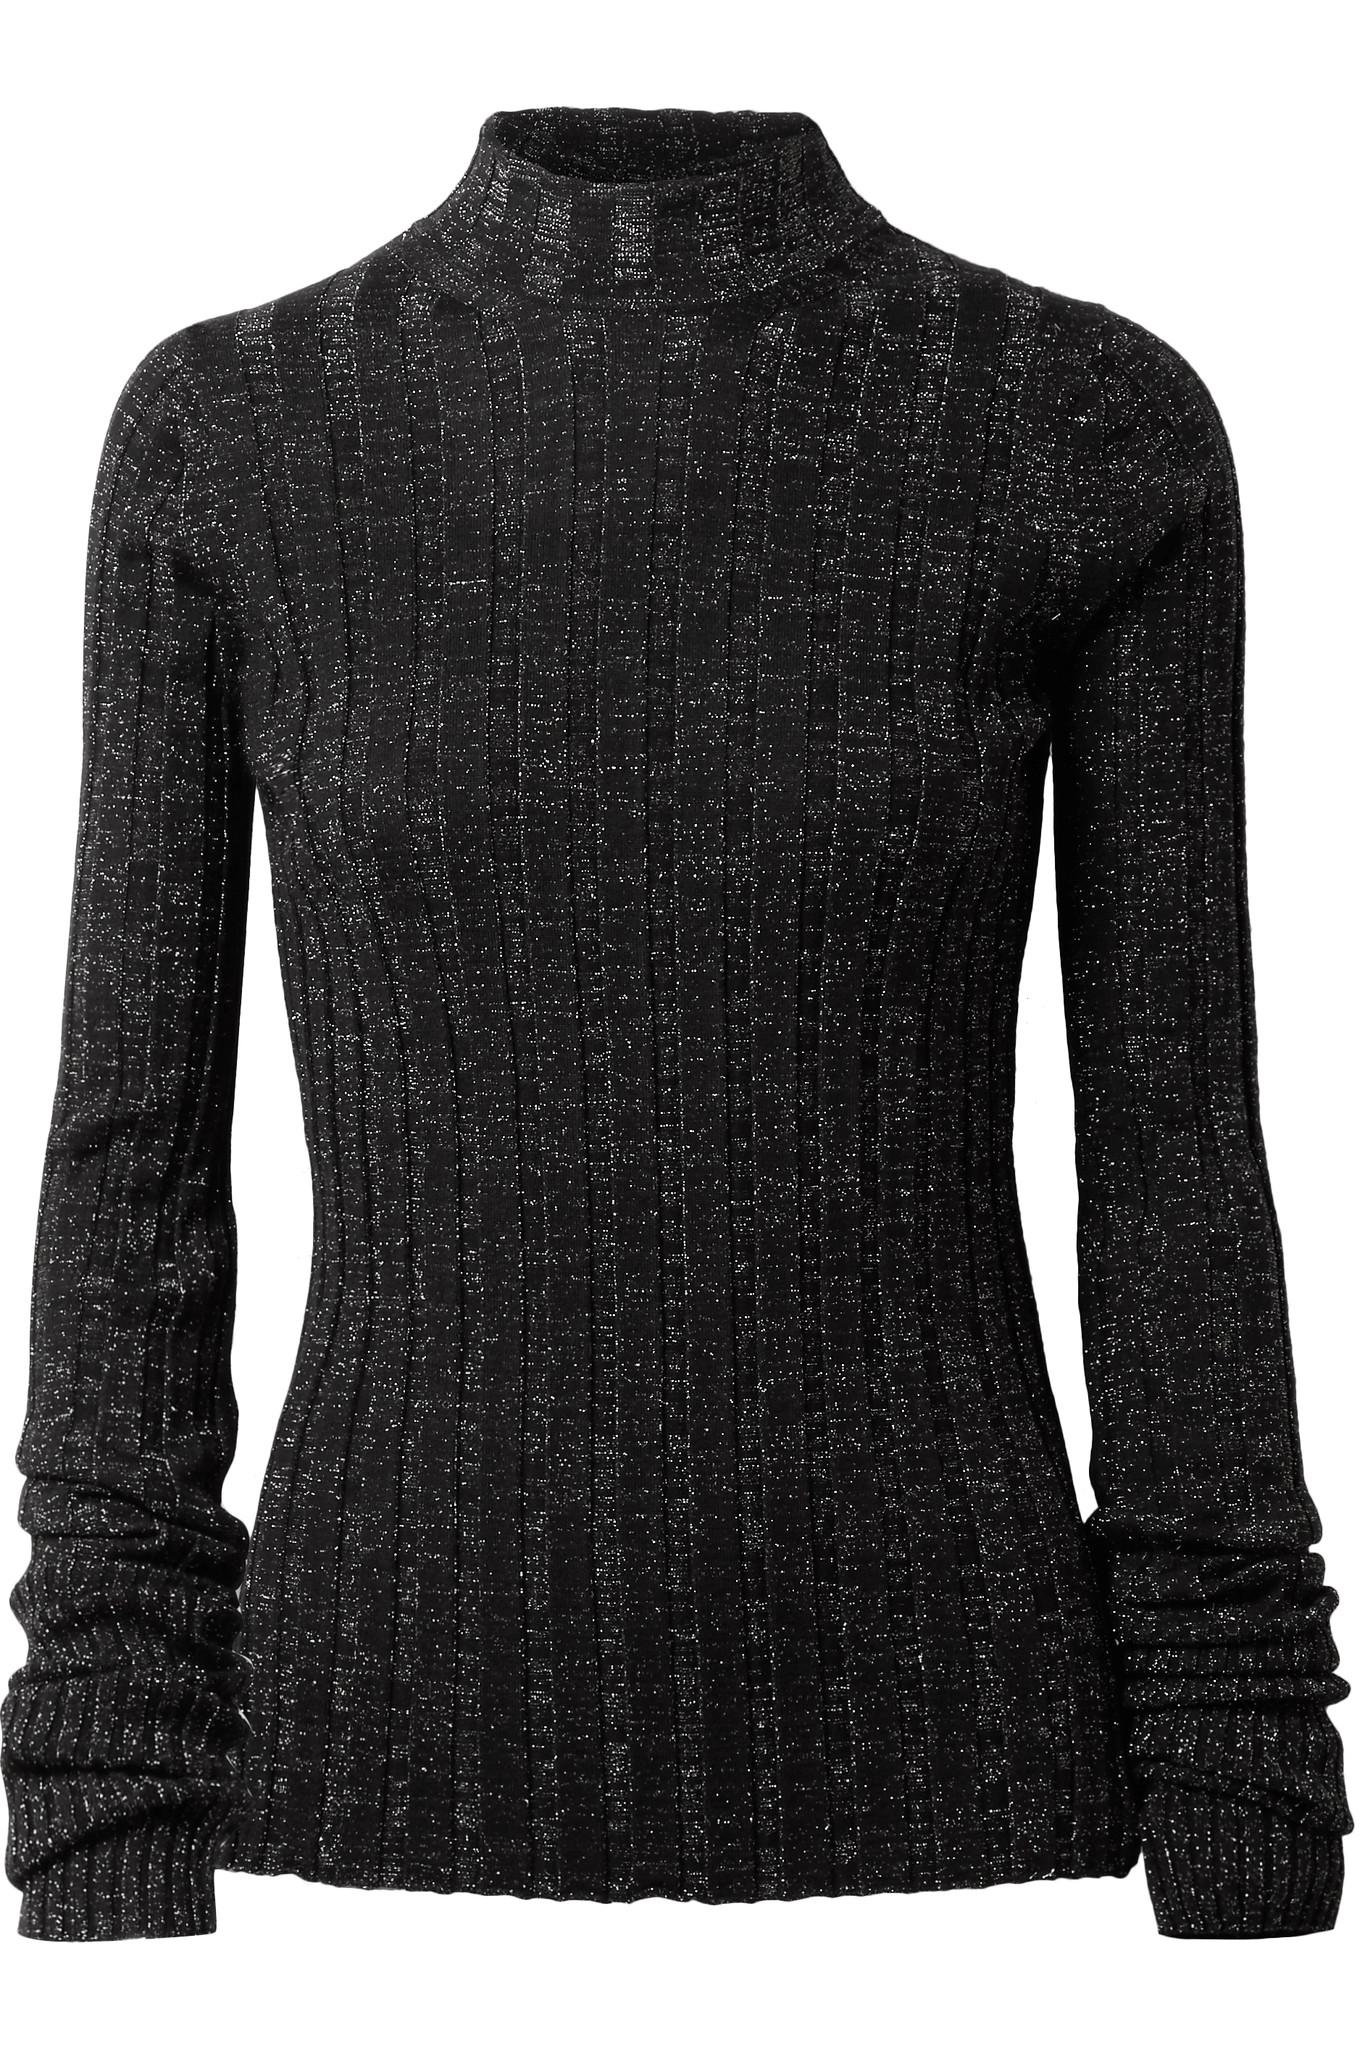 Theory Metallic Ribbed Merino Wool-blend Turtleneck Sweater in ...